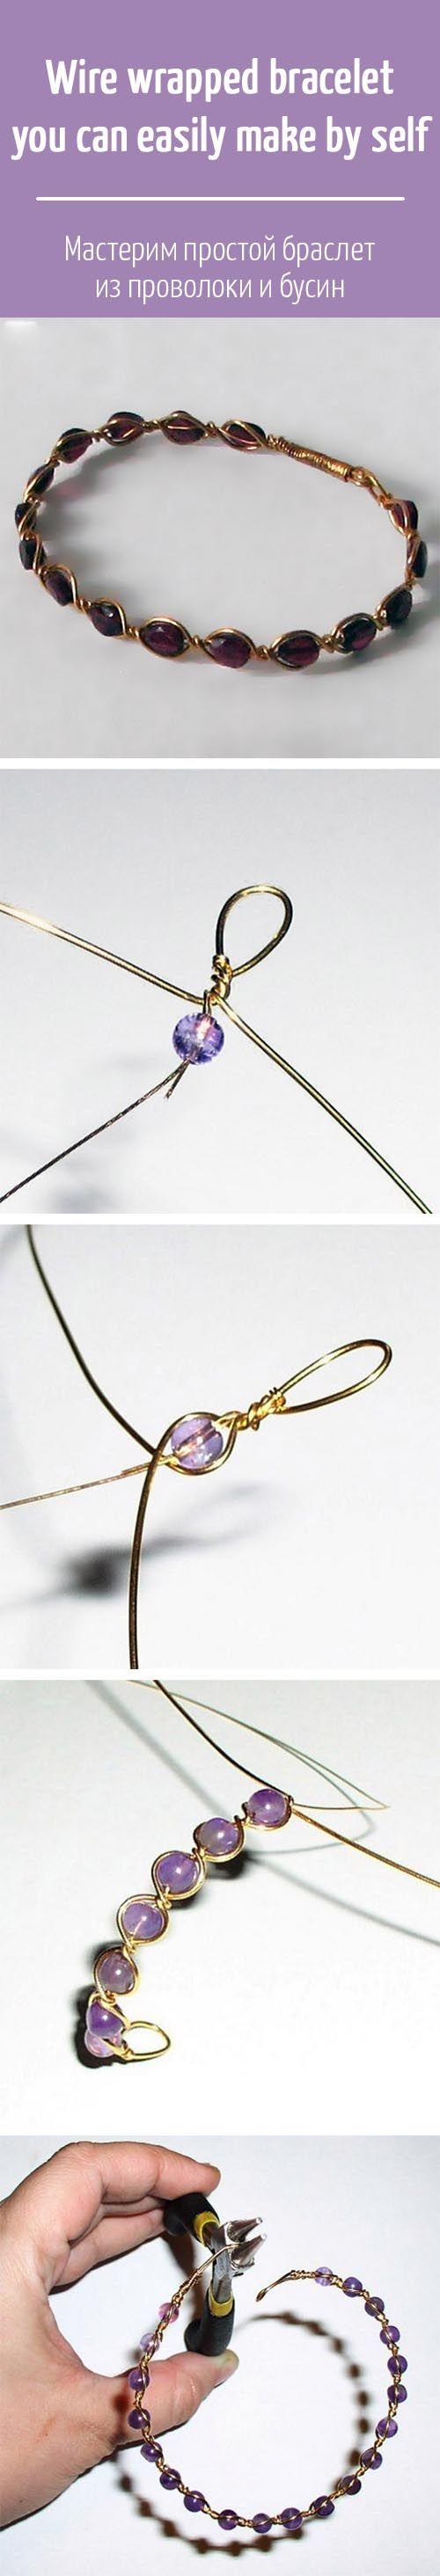 Wire wrapped bracelet you can easily make by self / Wire wrap для начинающих: мастерим простой браслет из проволоки и бусин